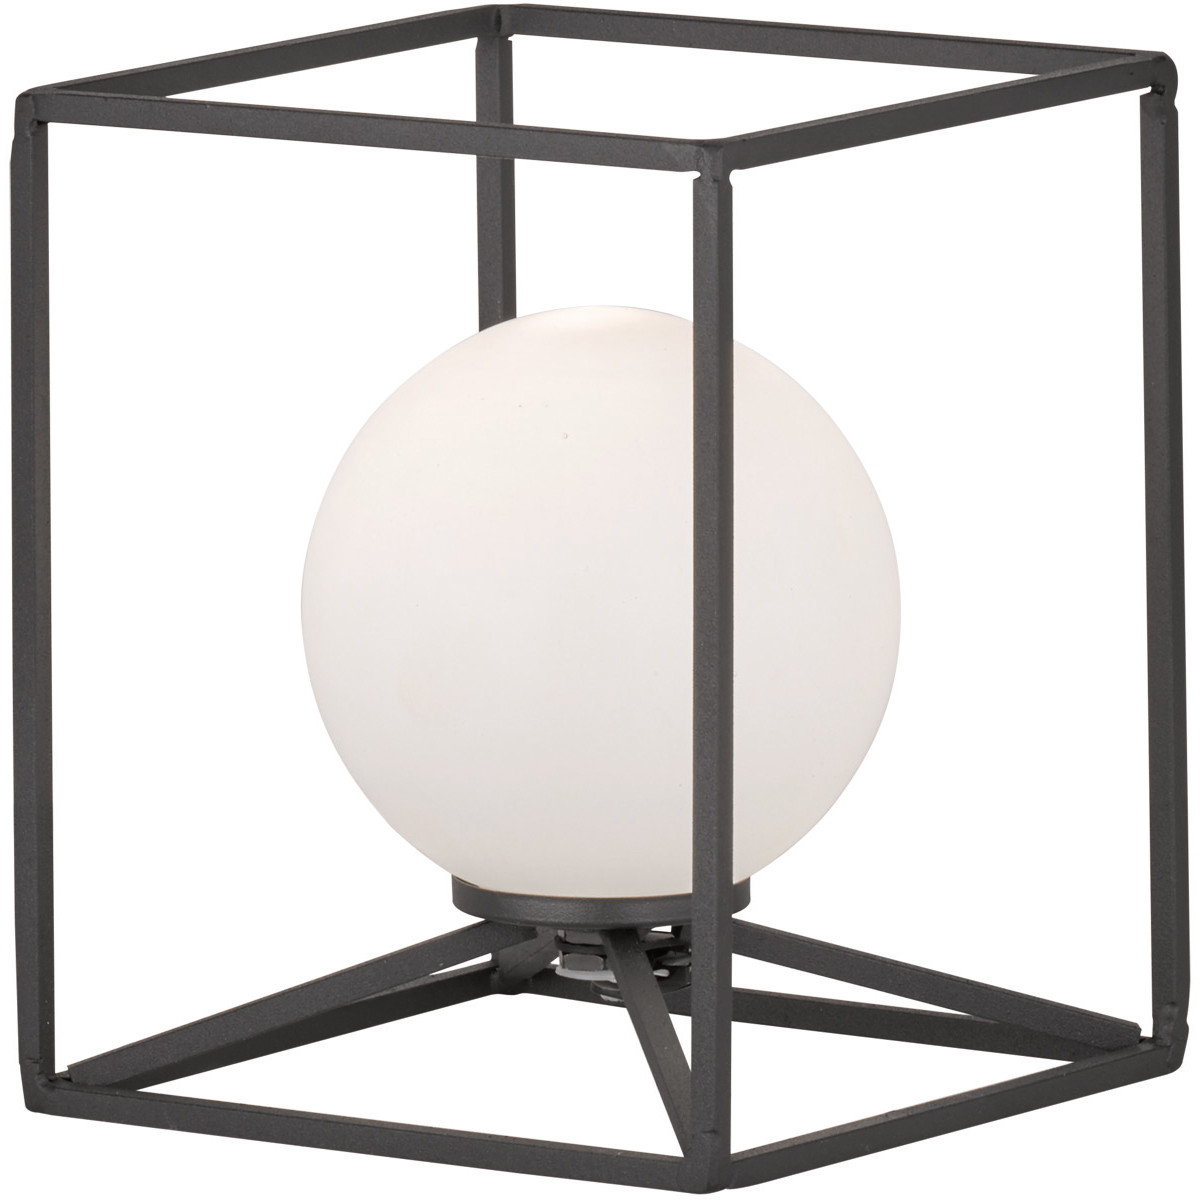 LED Tafellamp - Trion Gebia - G9 Fitting - Vierkant - Mat Zwart - Aluminium